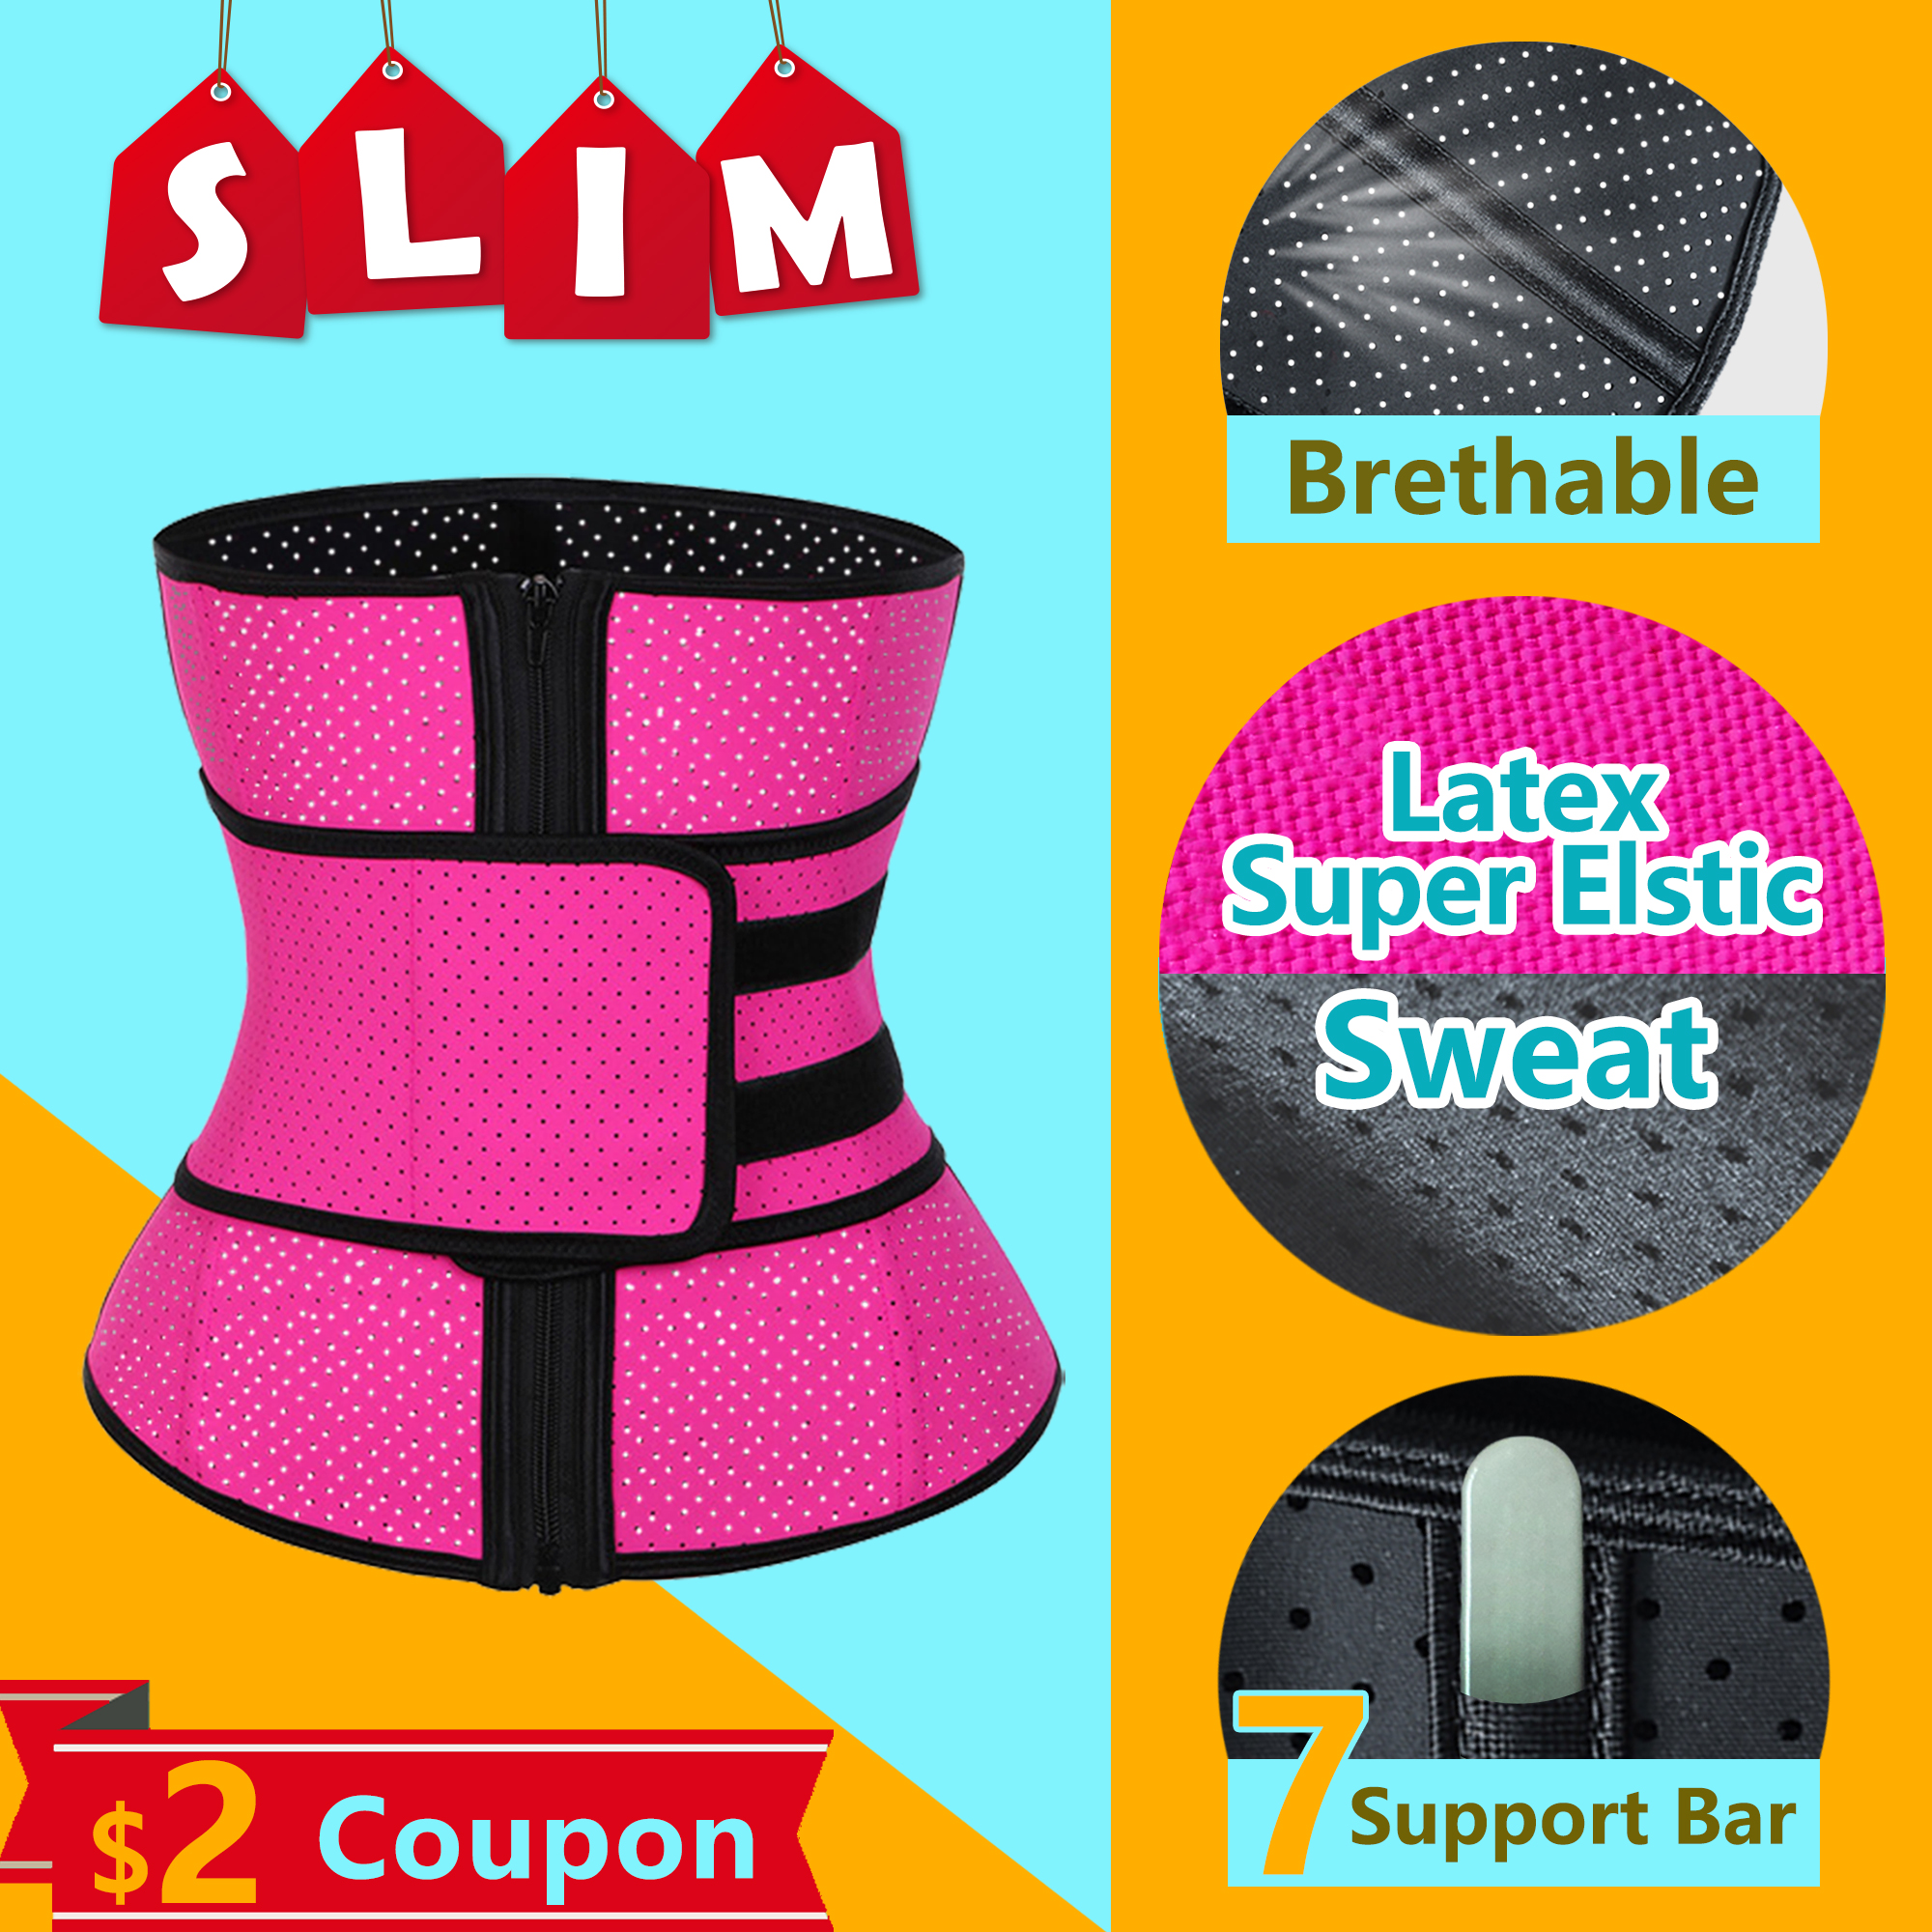 ROEGADYN Loss Sweat Band Wrap Fat Sports Waist Trimmer Belt For Women Waist Trimmer Breathable Fitness CrossFit Waist SupportWaist Support   -